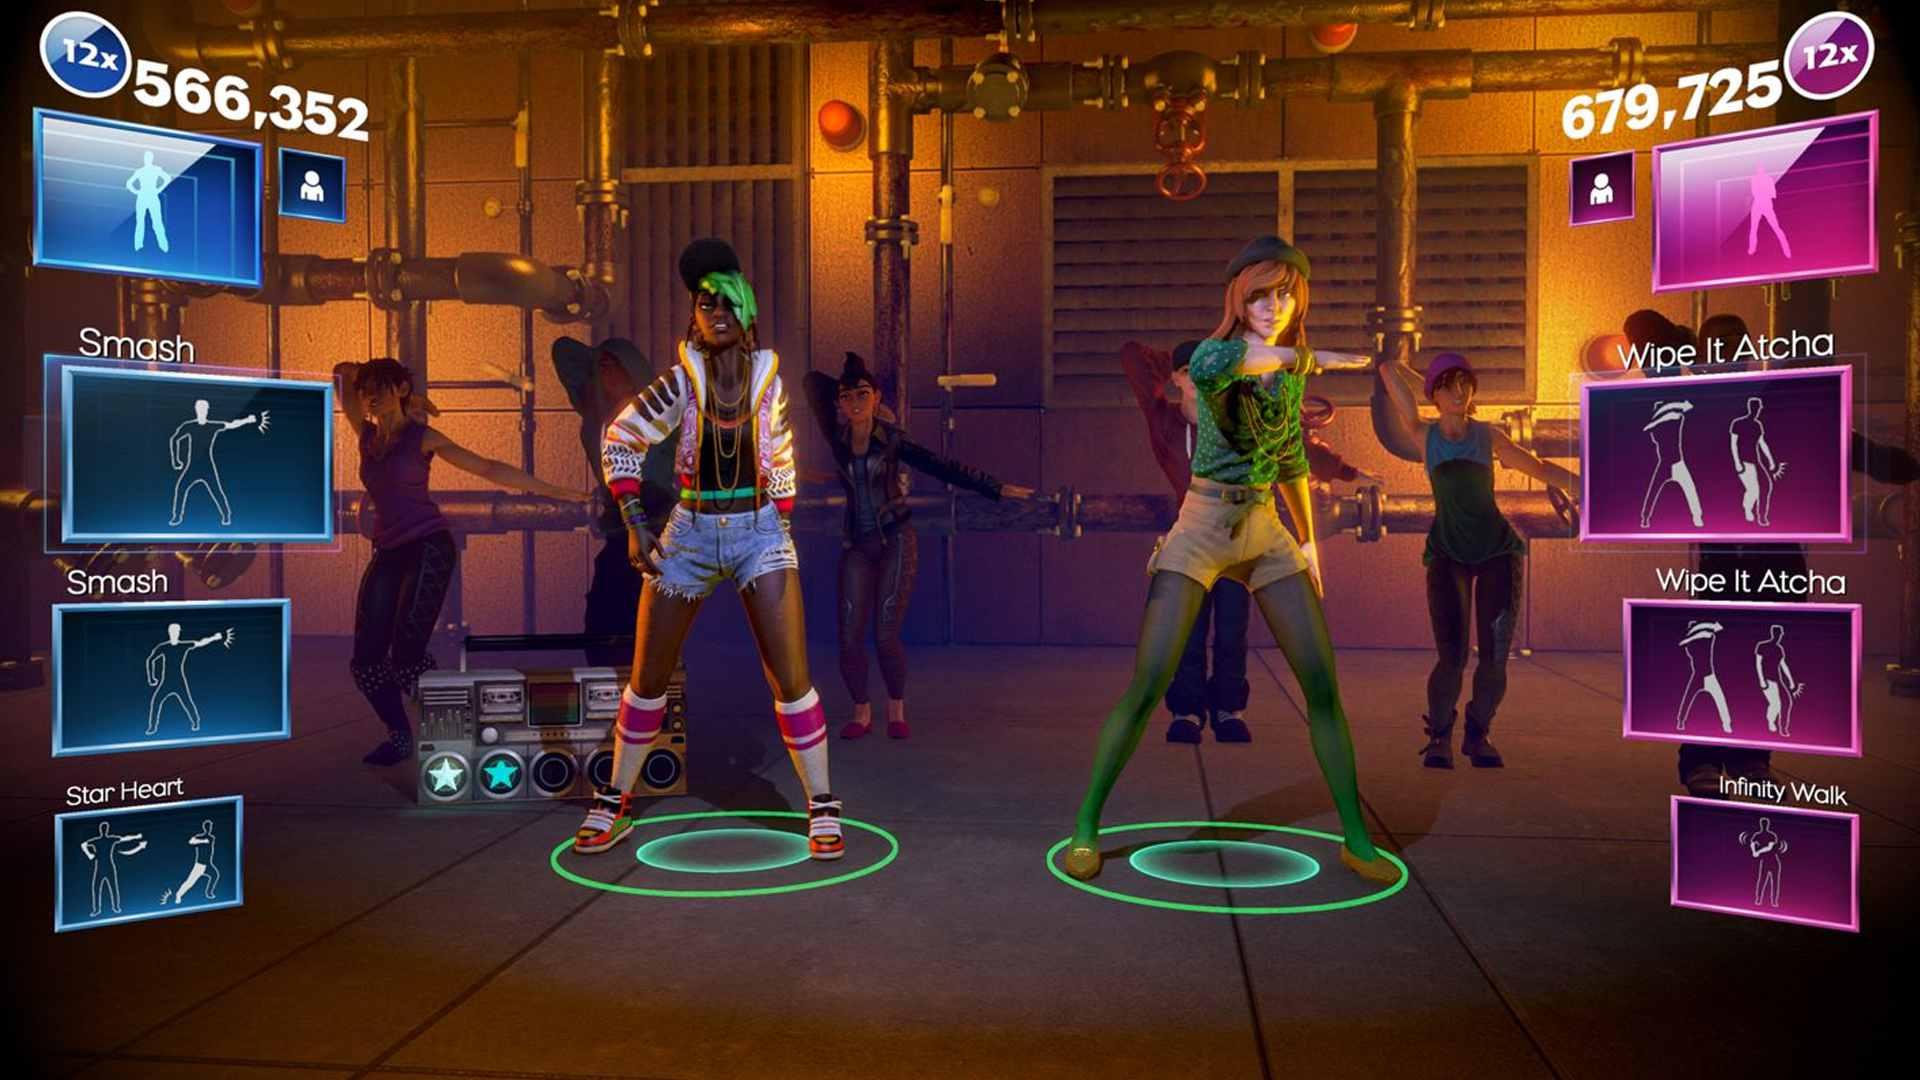 Dance Central Spotlight offline dance game on Xbox One.